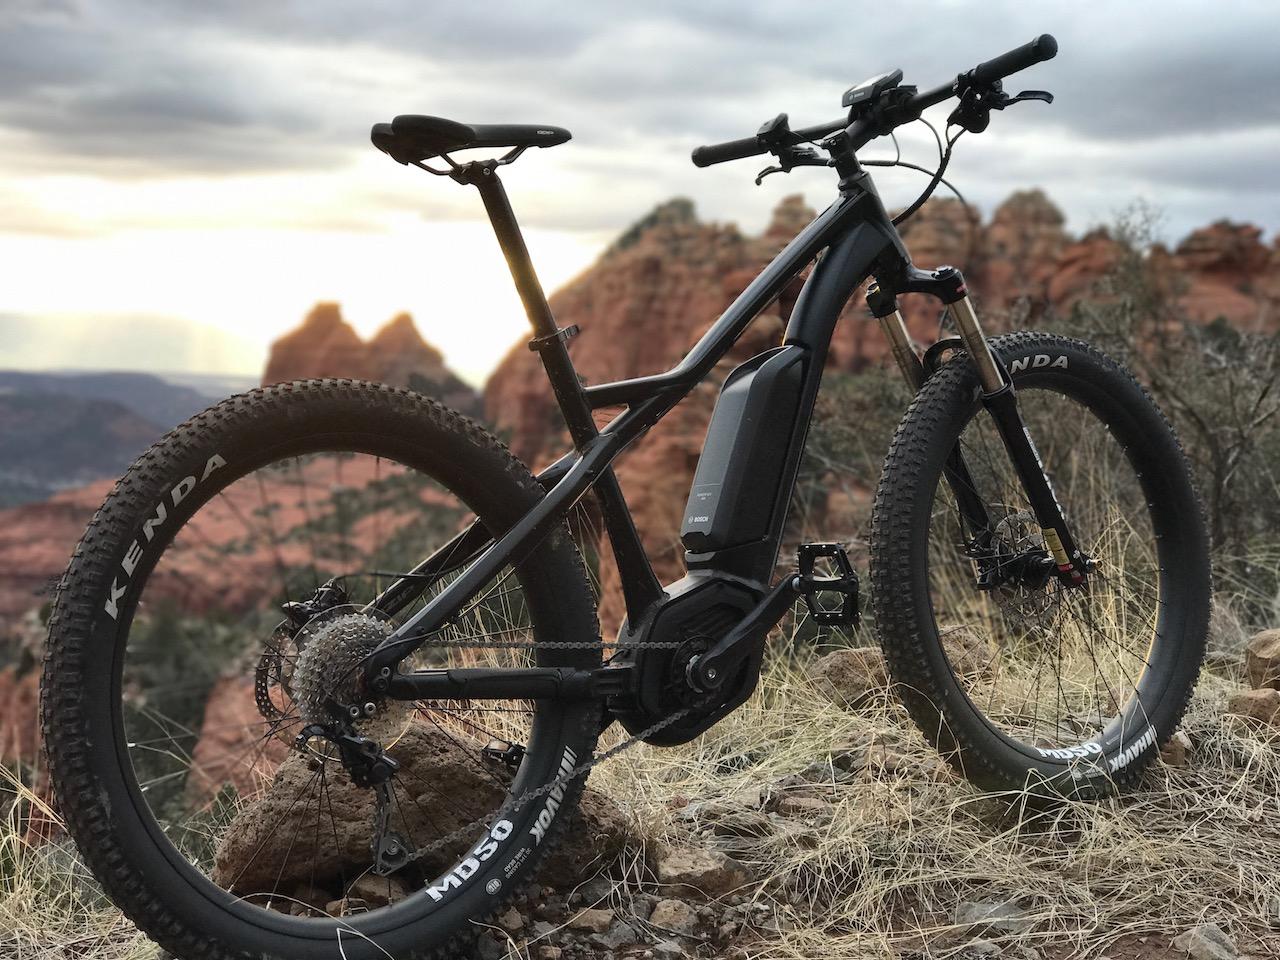 izip-e3-peak-electric-mountain-bike-8